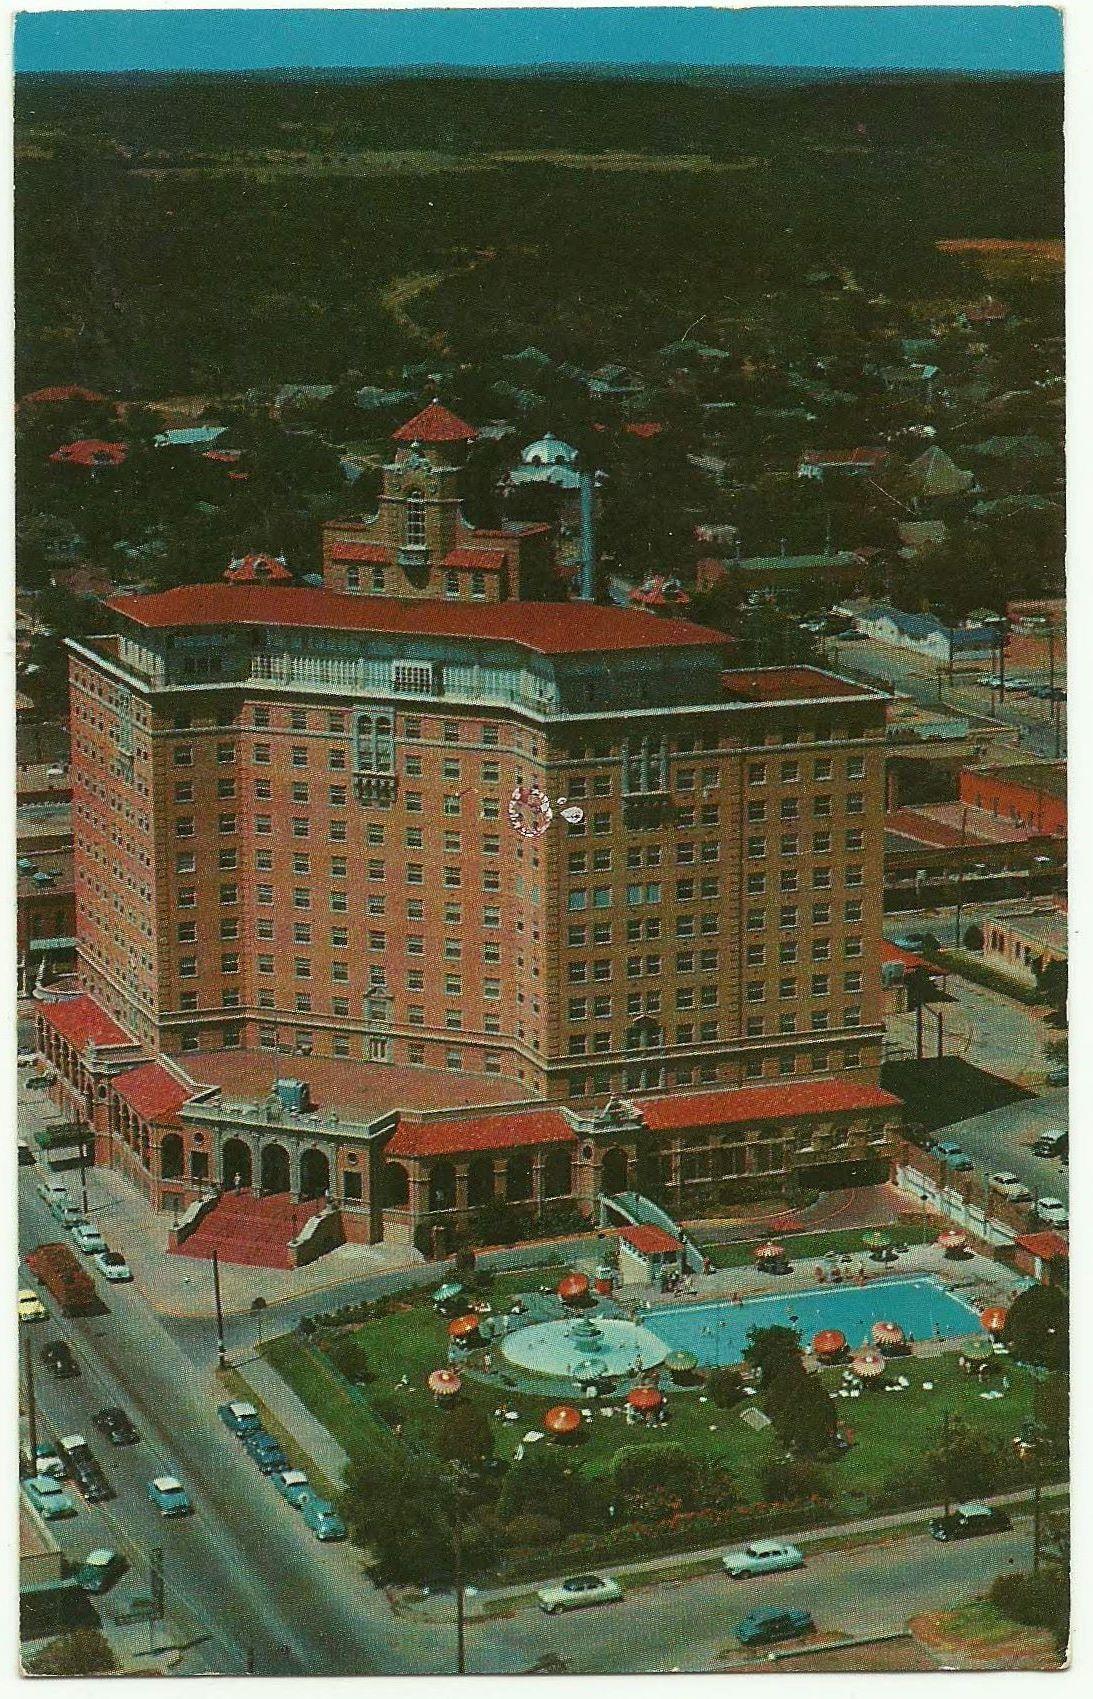 Baker Hotel Mineral Wells Tx Postmarked 1958